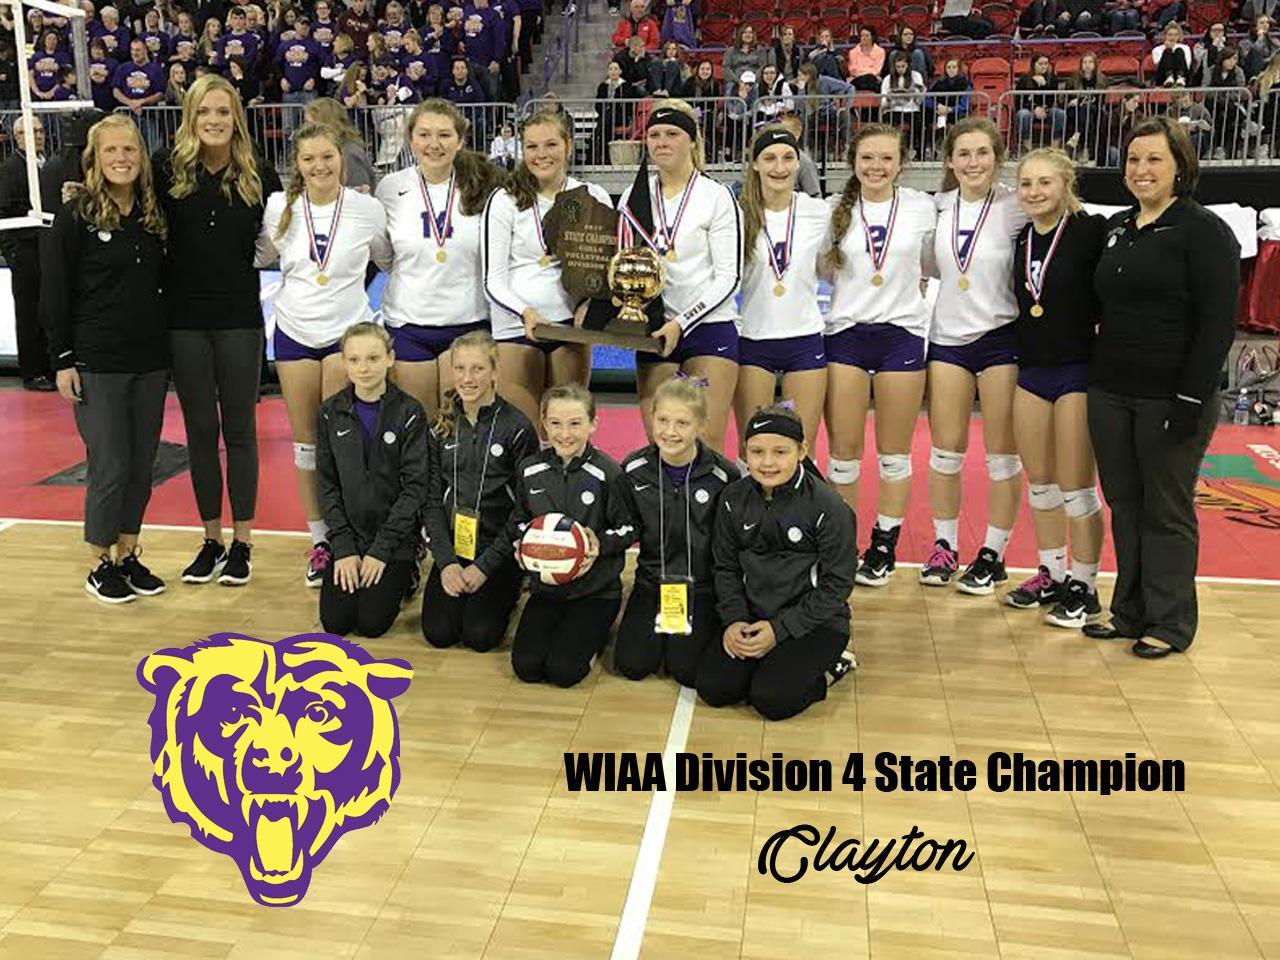 Division 4 State Champion Clayton